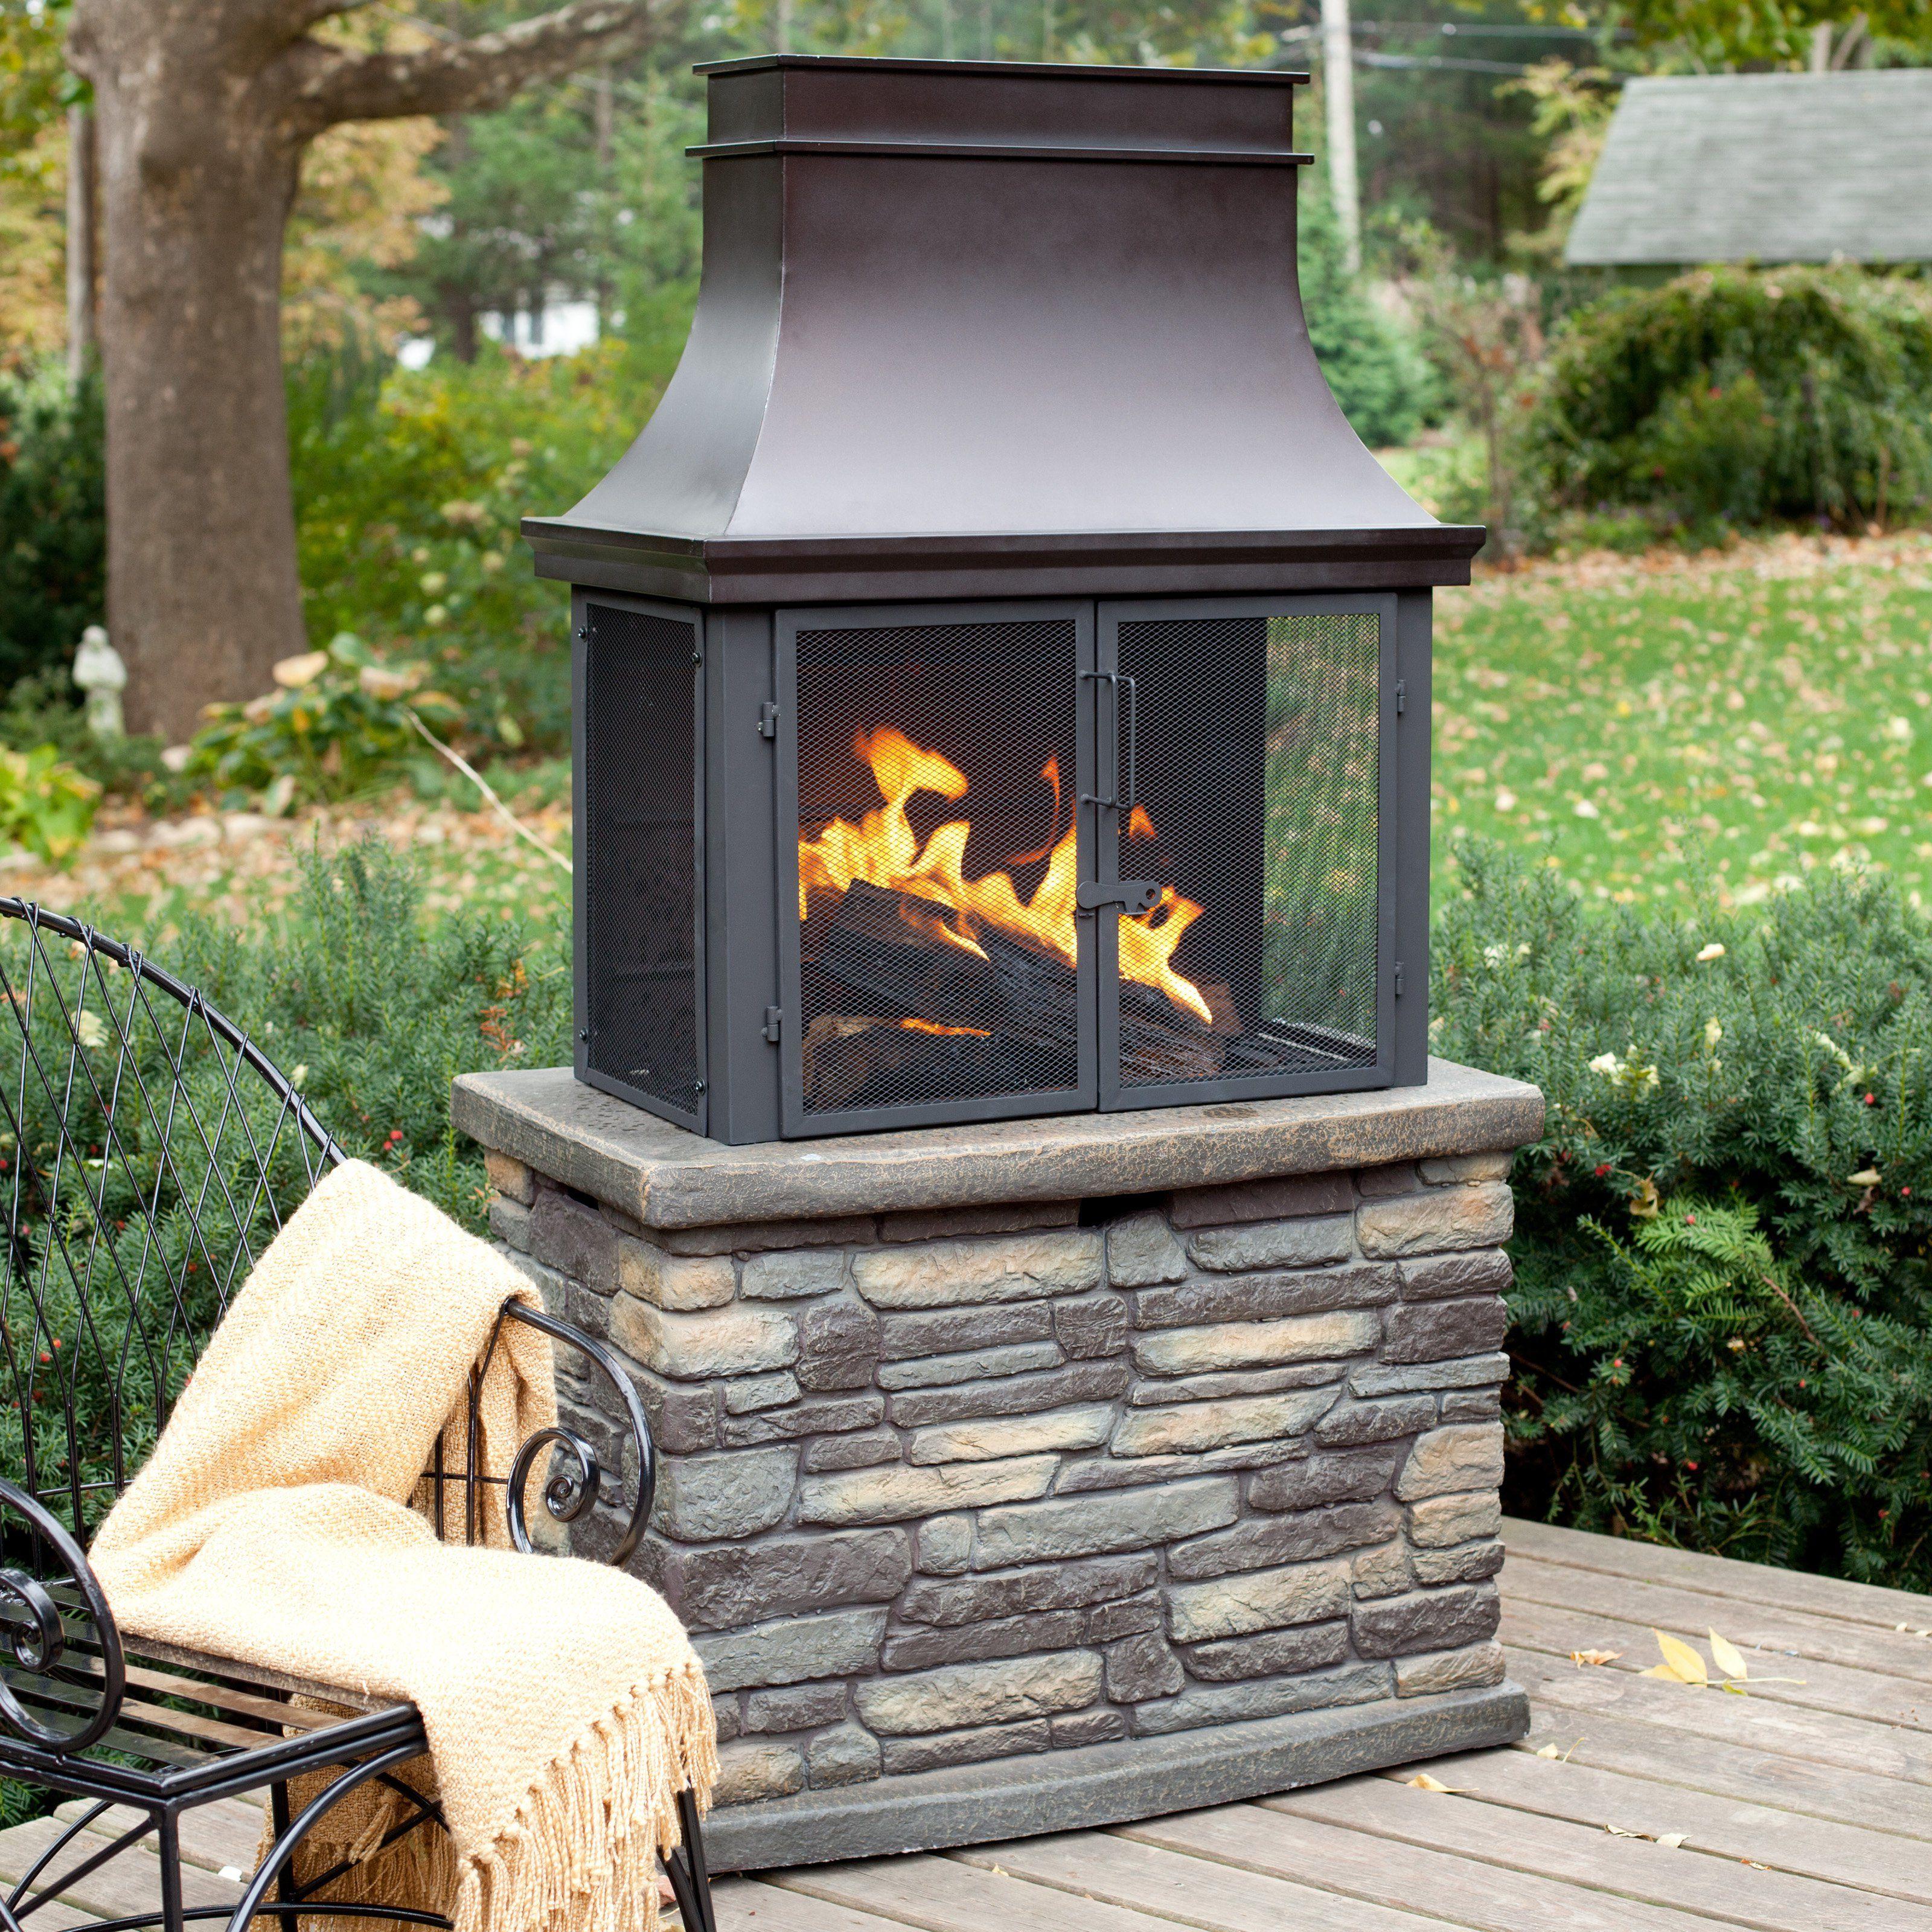 High Quality Bond Wood Burning Outdoor Fireplace   $ @hayneedle